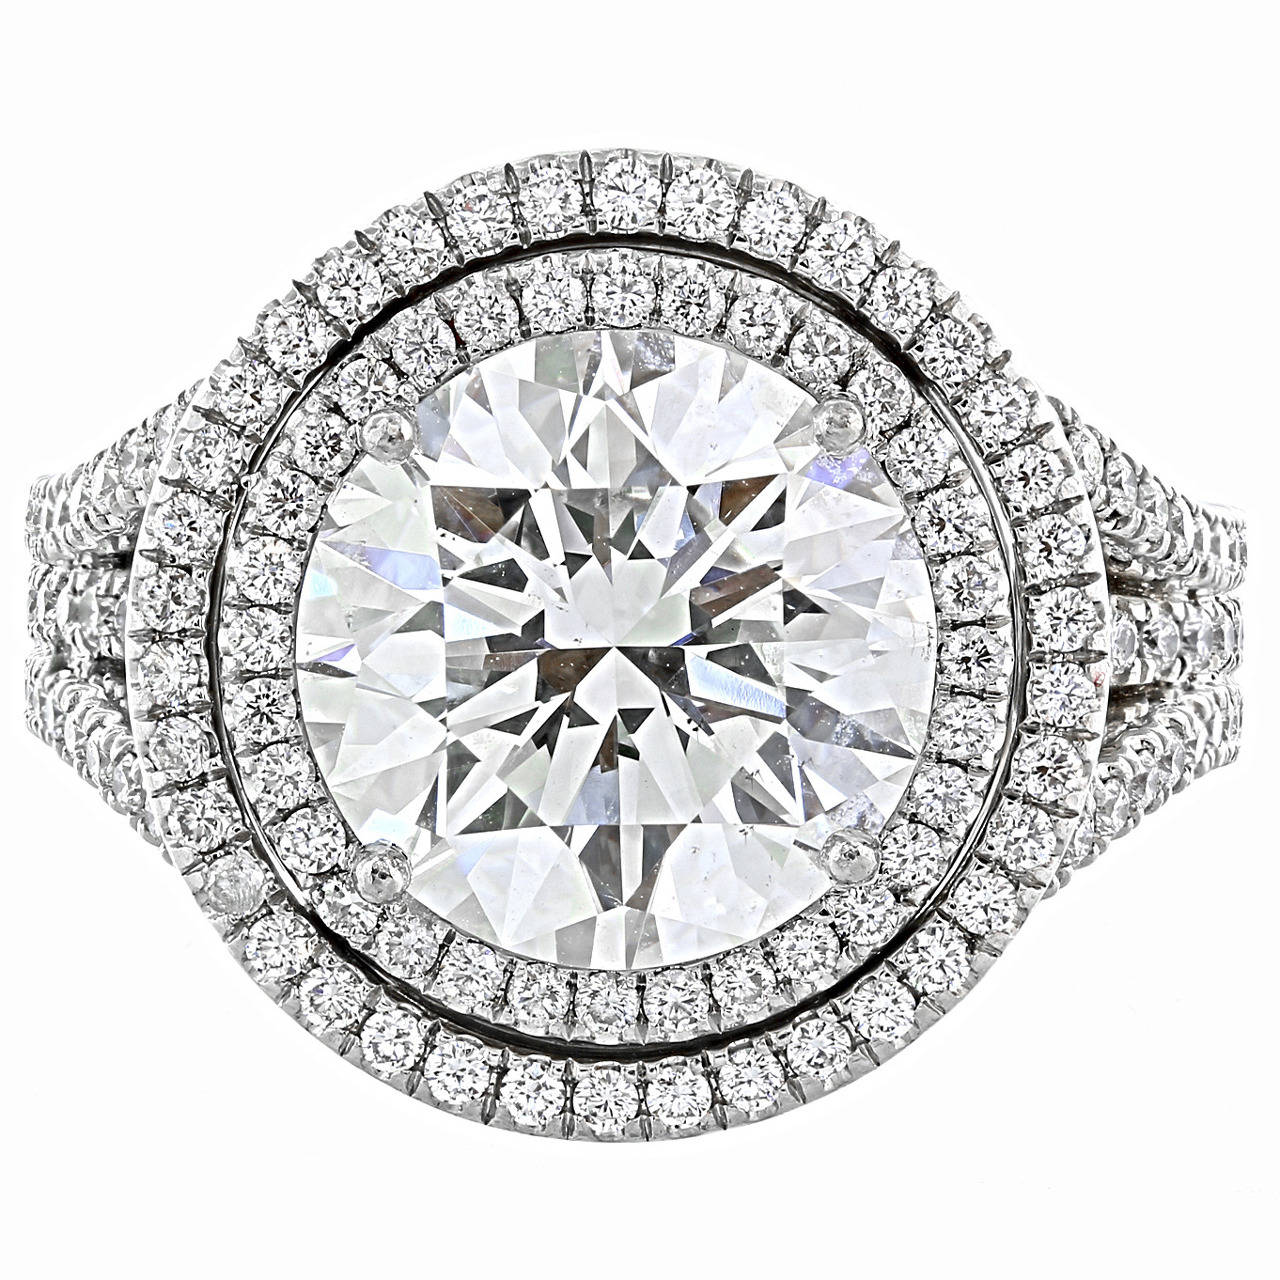 DeBeers GIA Certified 5.03 Carat I/SI1 Round Brilliant Cut Diamond Ring